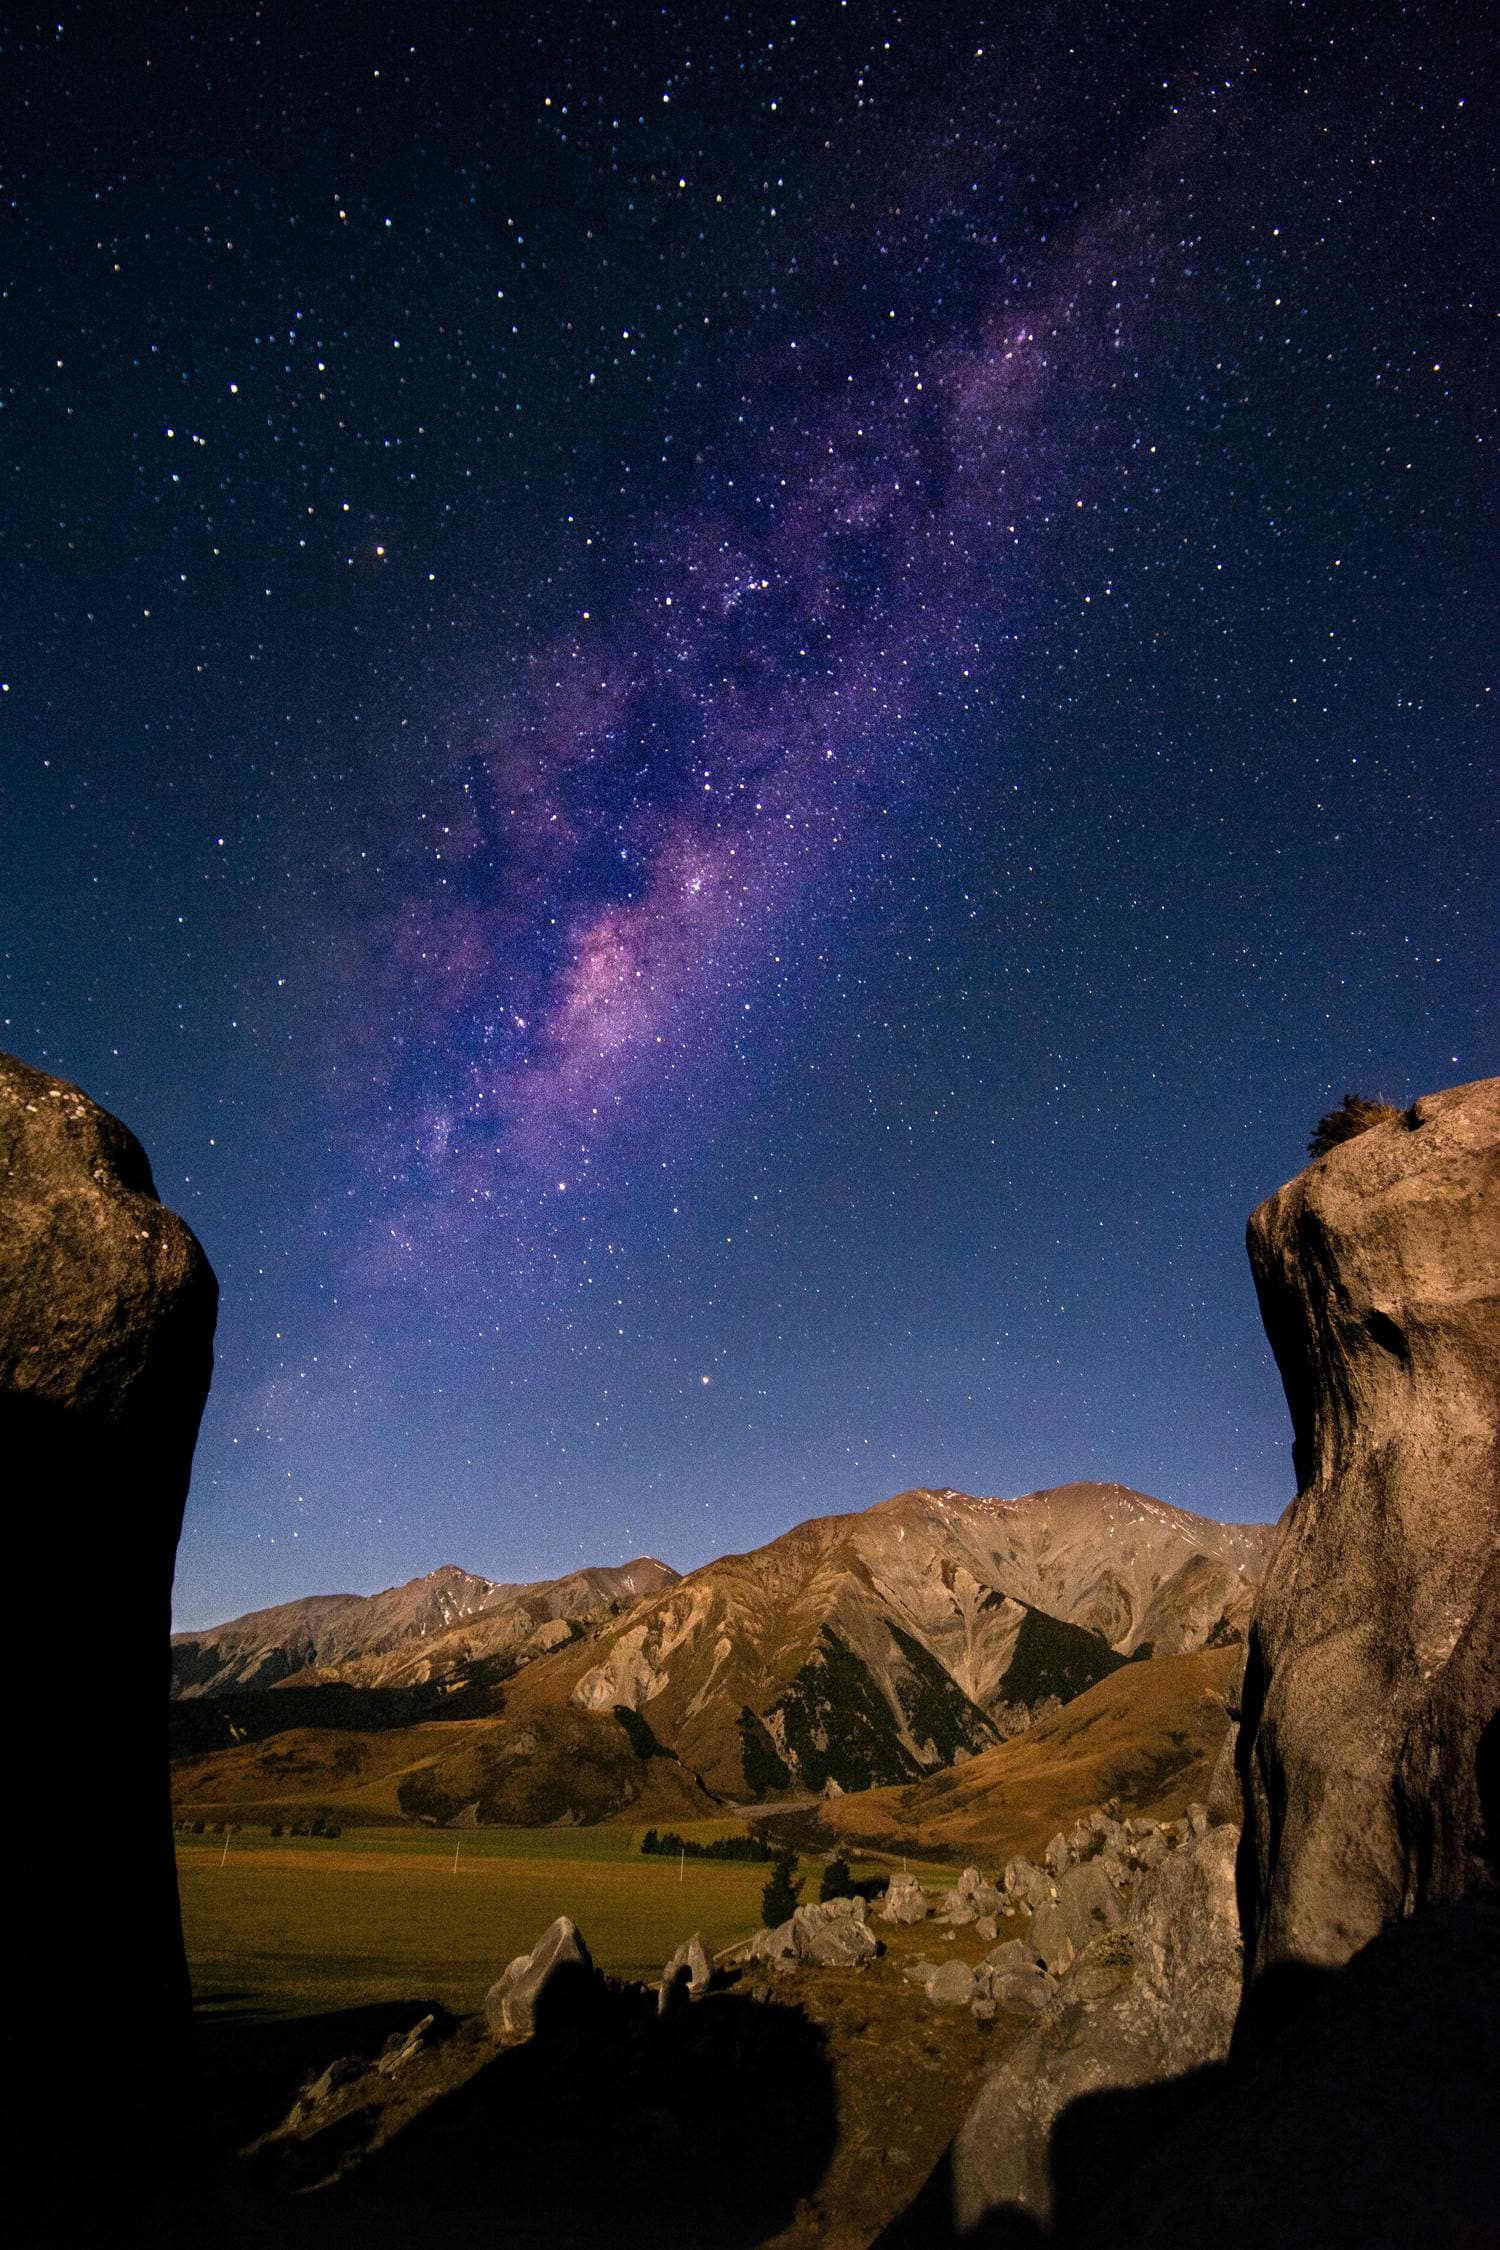 paisaje nocturno con objetivo gran angular